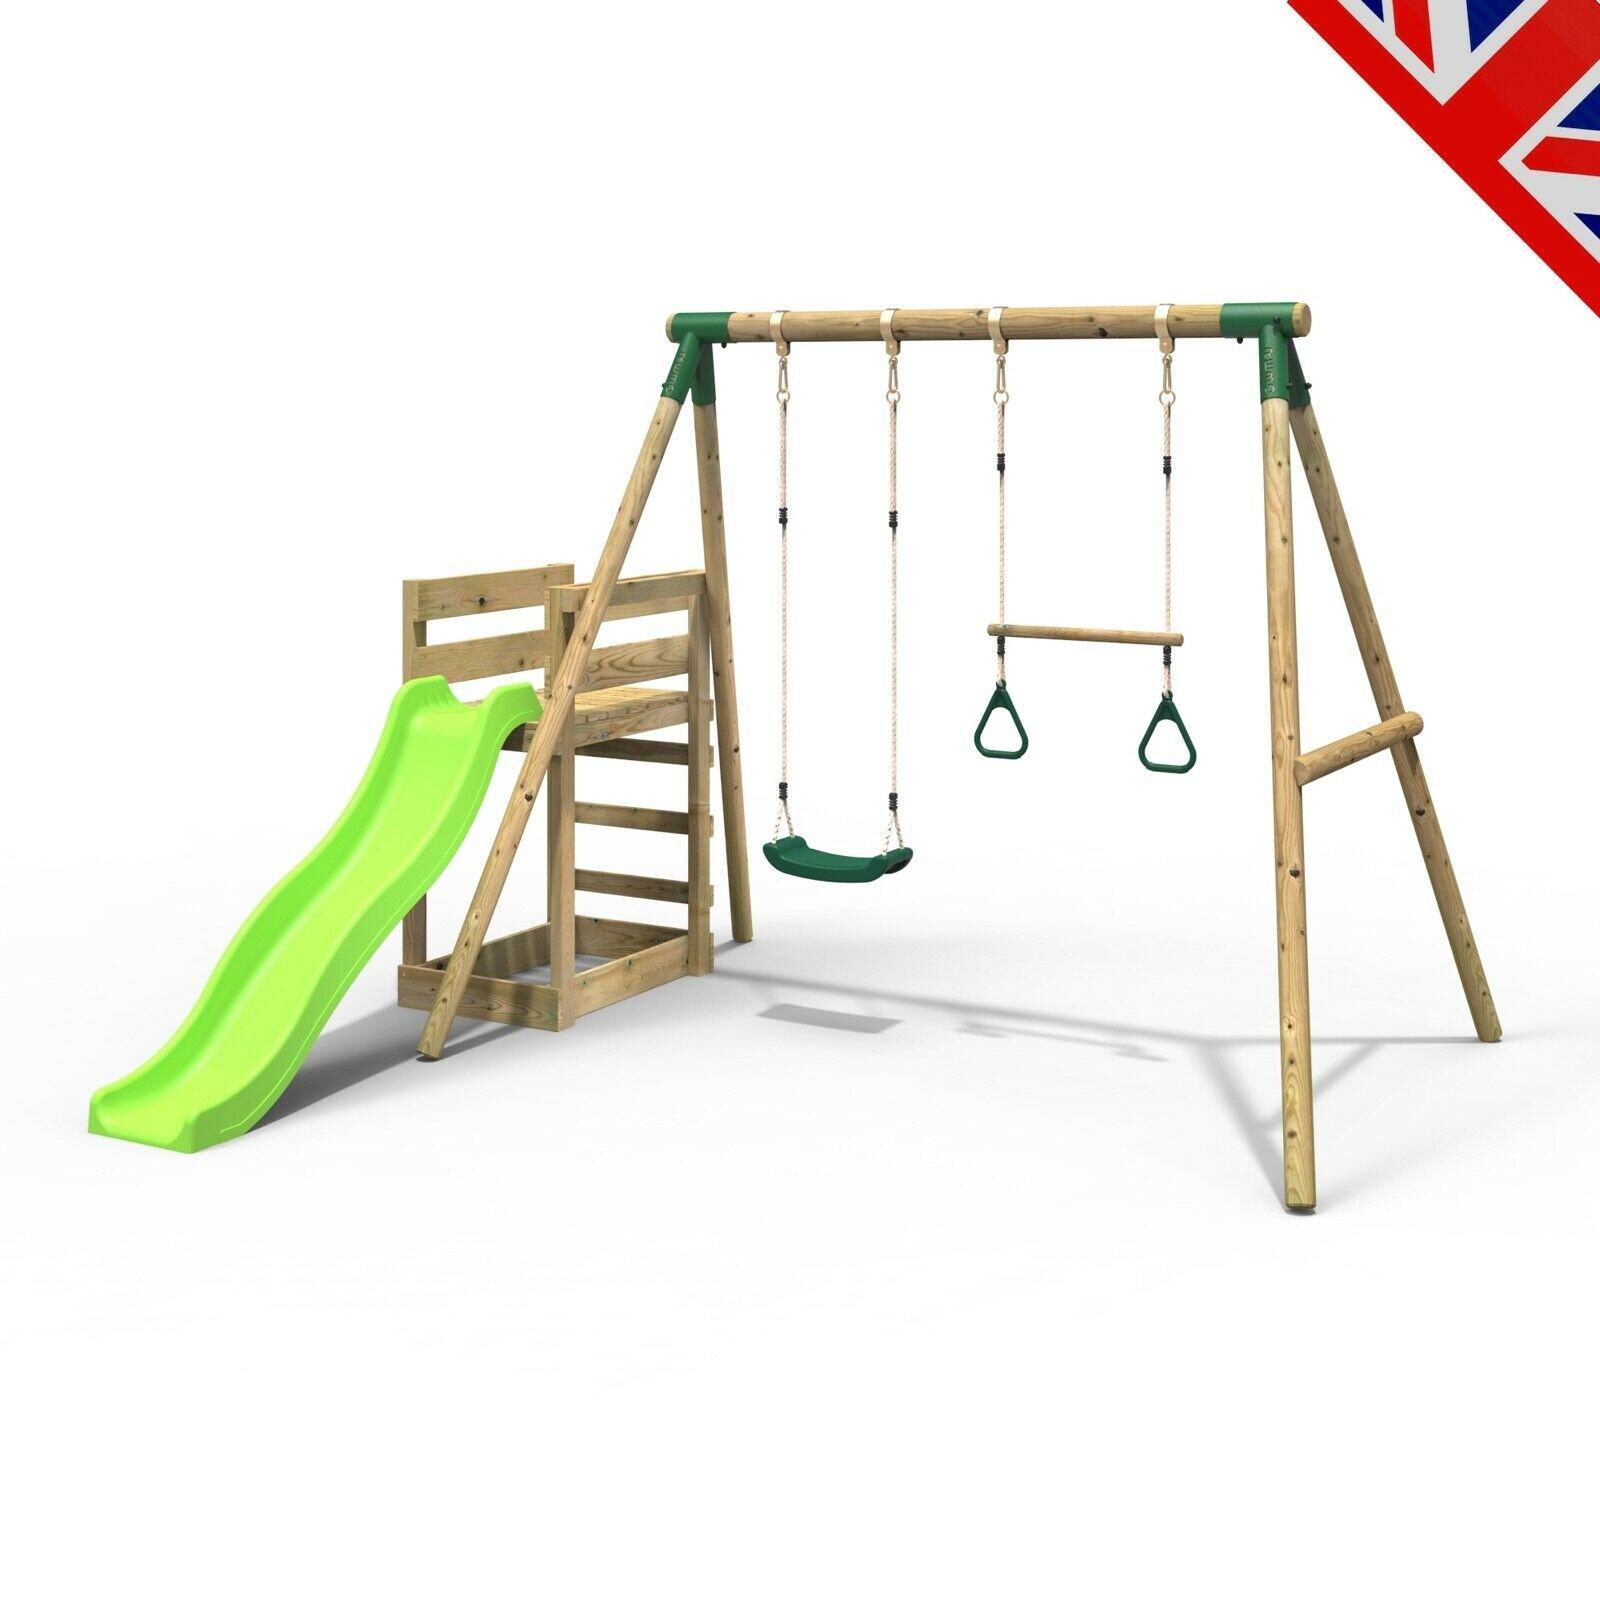 Rebo Wooden Swing Set plus Deck & Slide - Janus Green £223.16 @ eBay outdoortoy